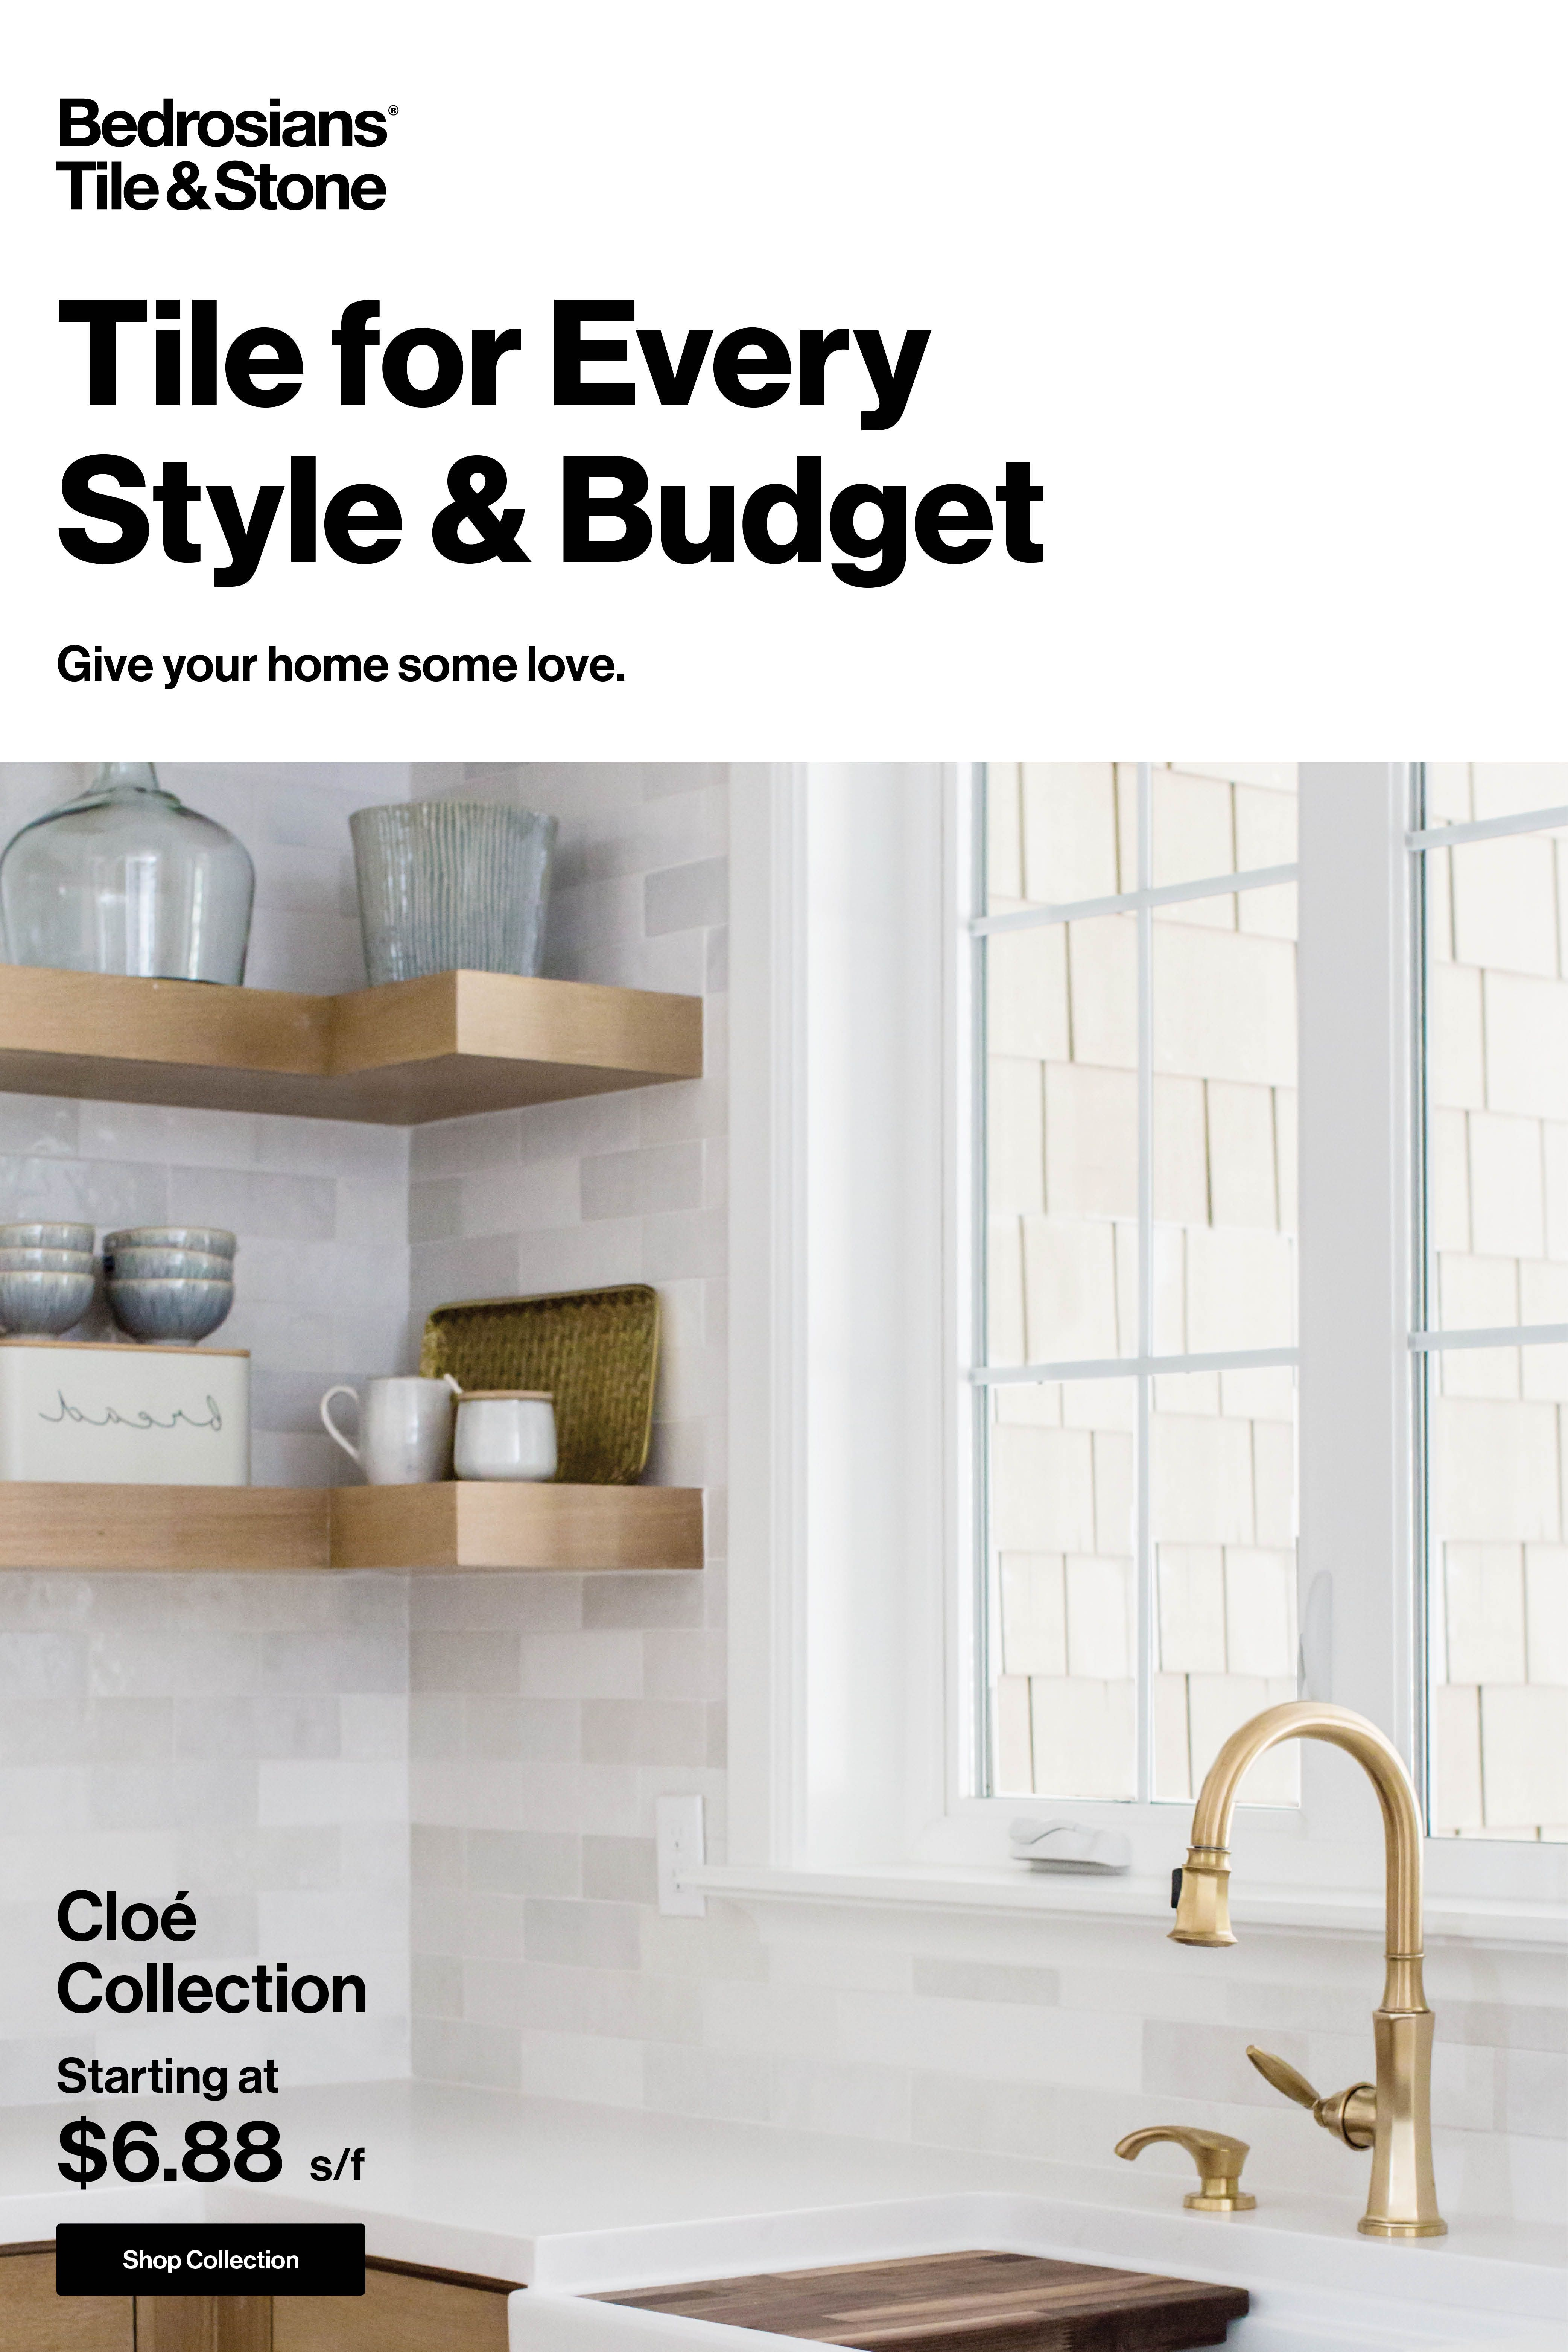 Cloe 2 5 X 8 Wall Tile In White Kitchen Remodel Kitchen Inspirations Kitchen Renovation